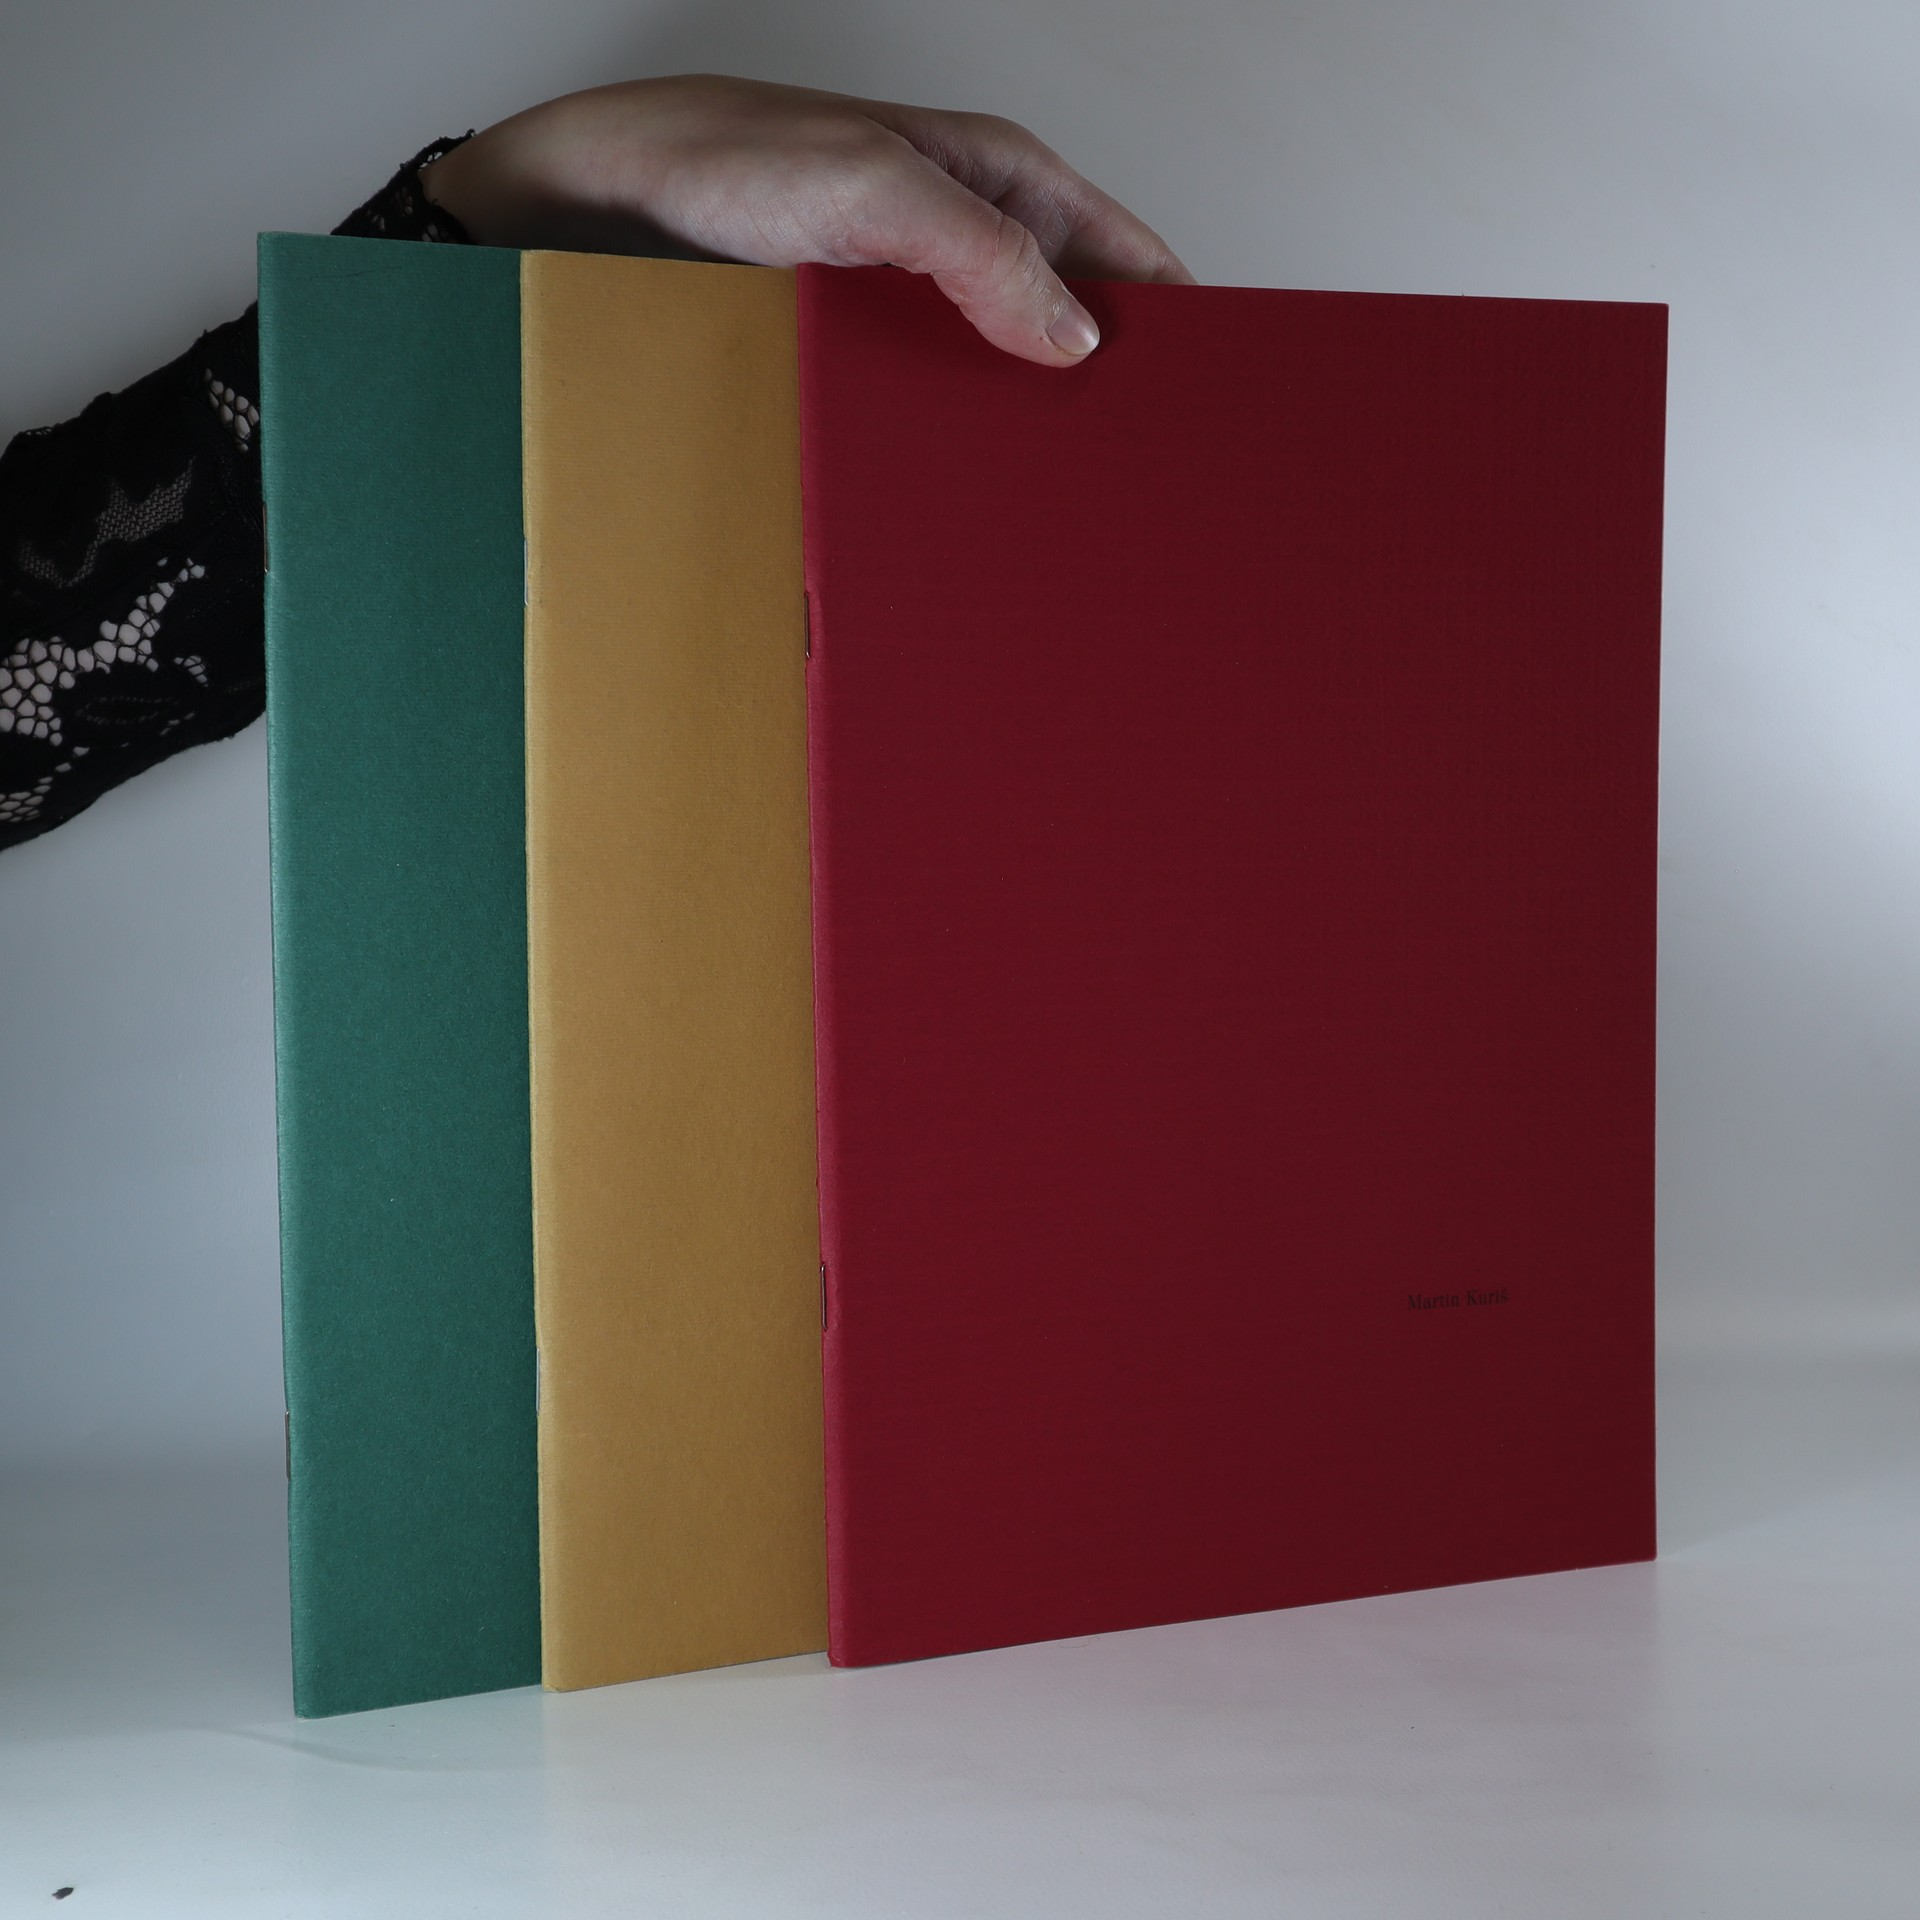 antikvární kniha 3x Martin Kuriš (3 svazky, viz foto), 2000-2001